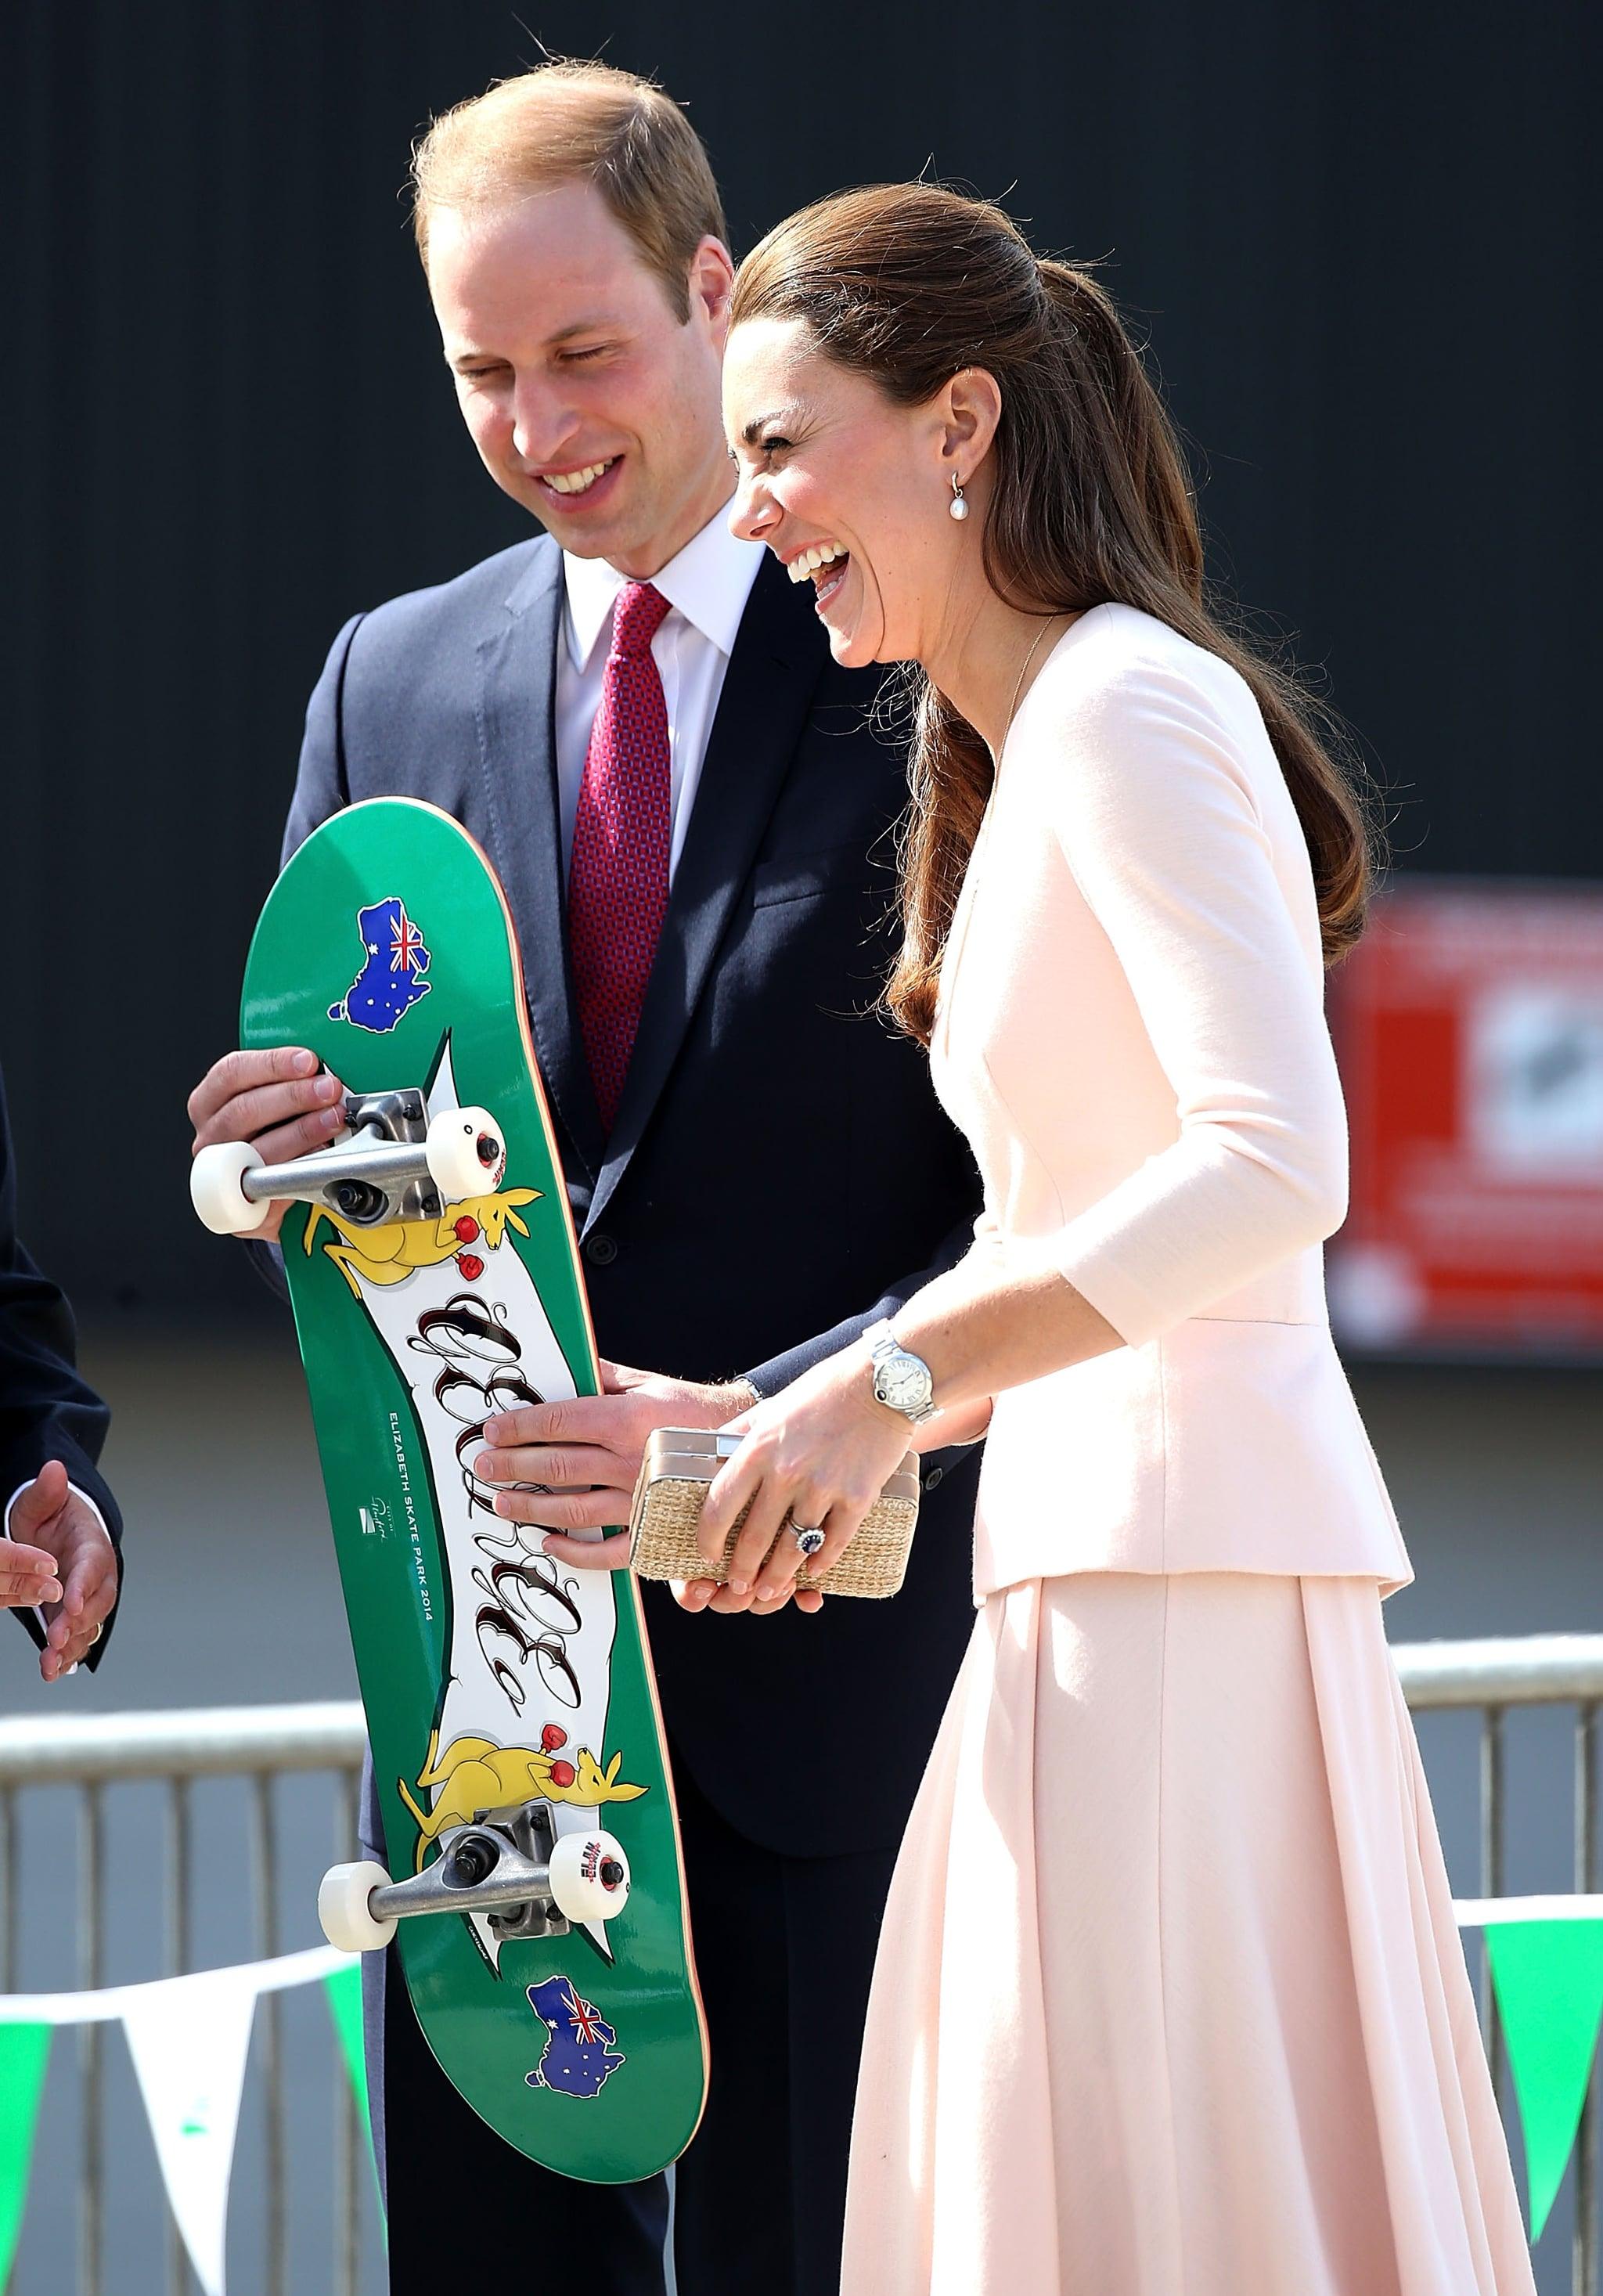 """William Skateboarding? Ha-ha-ha!"""